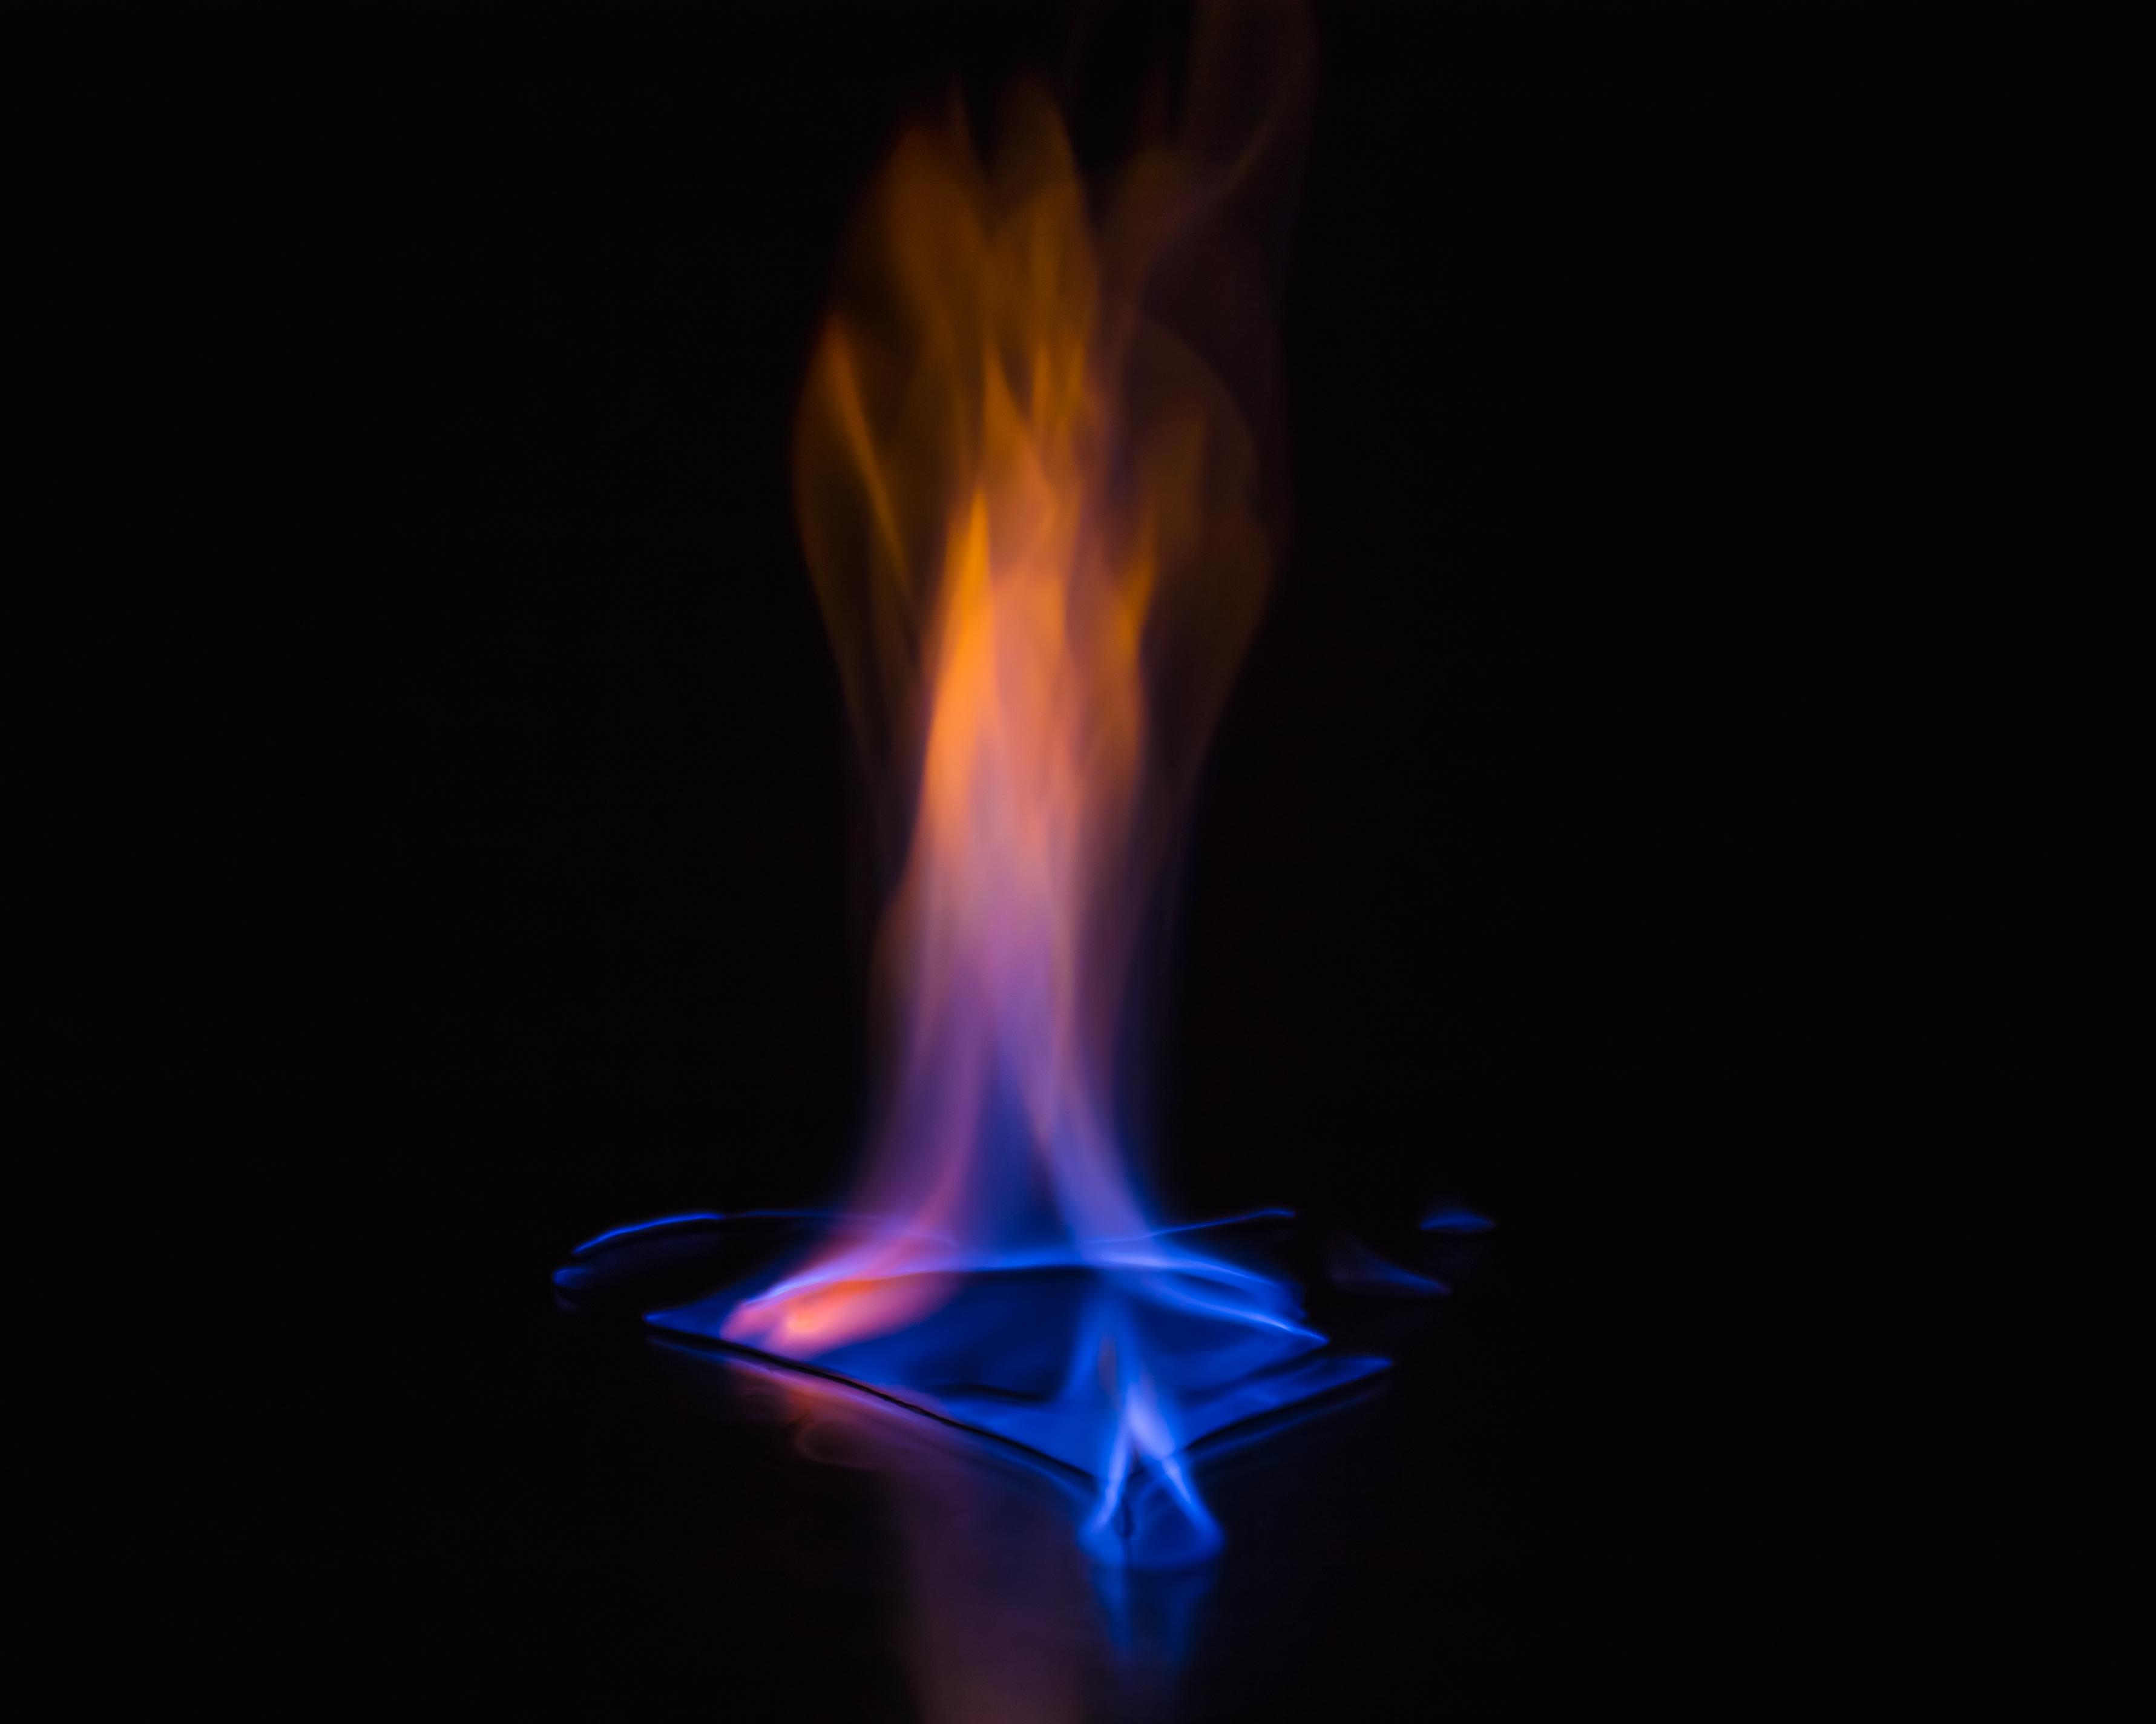 Foto Stok Gratis Tentang Api, Api Biru, Background Hitam